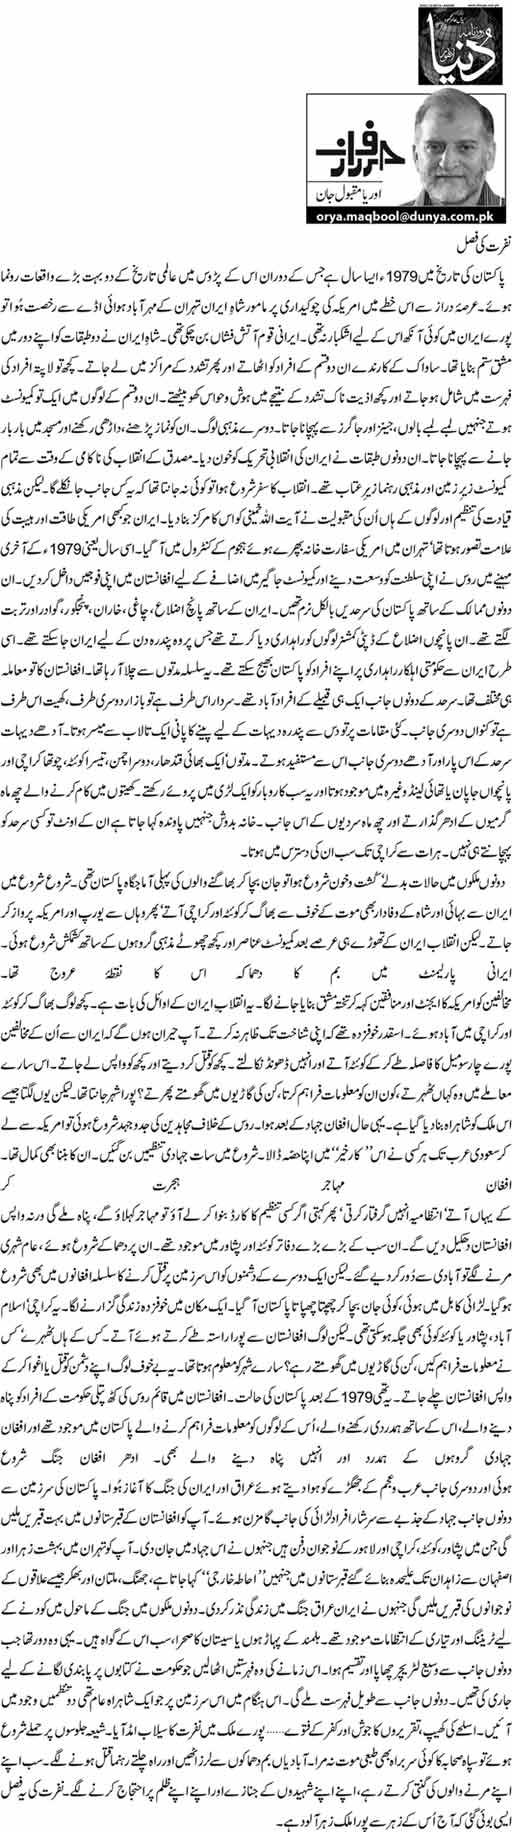 Nafrat ki fasal - Orya Maqbool Jan